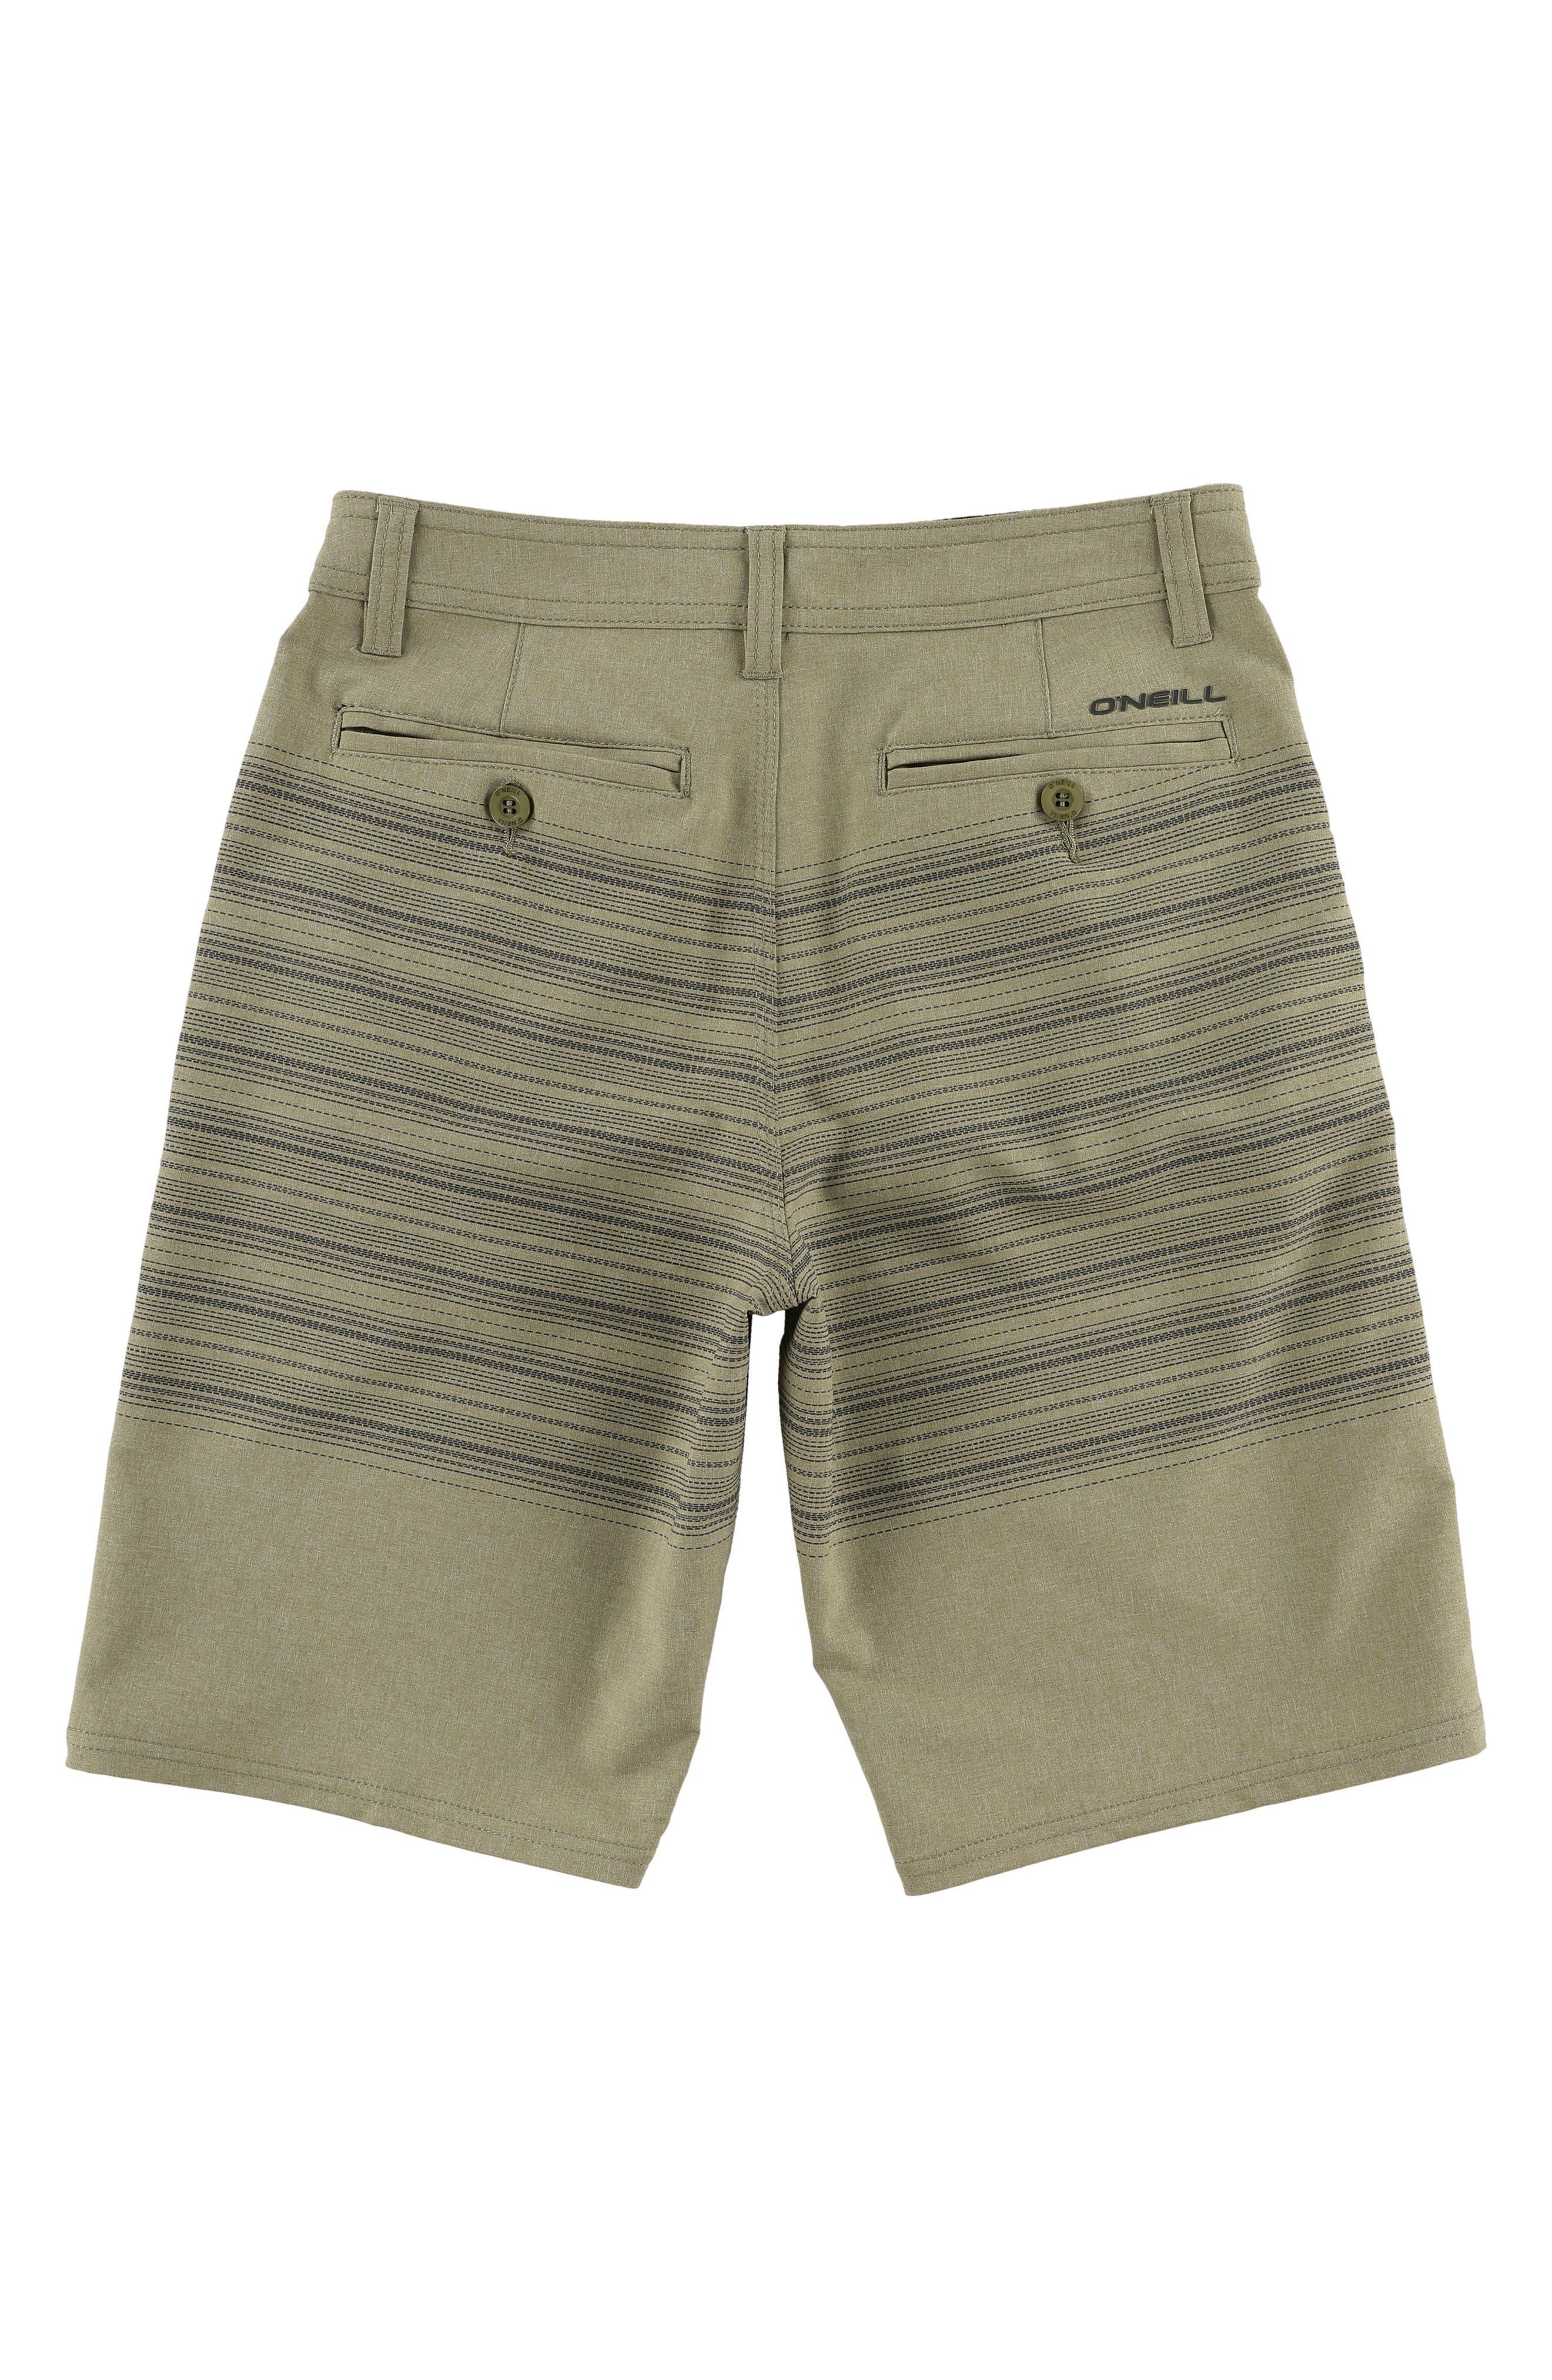 Loaded Schematic Hybrid Board Shorts,                             Alternate thumbnail 2, color,                             Khaki